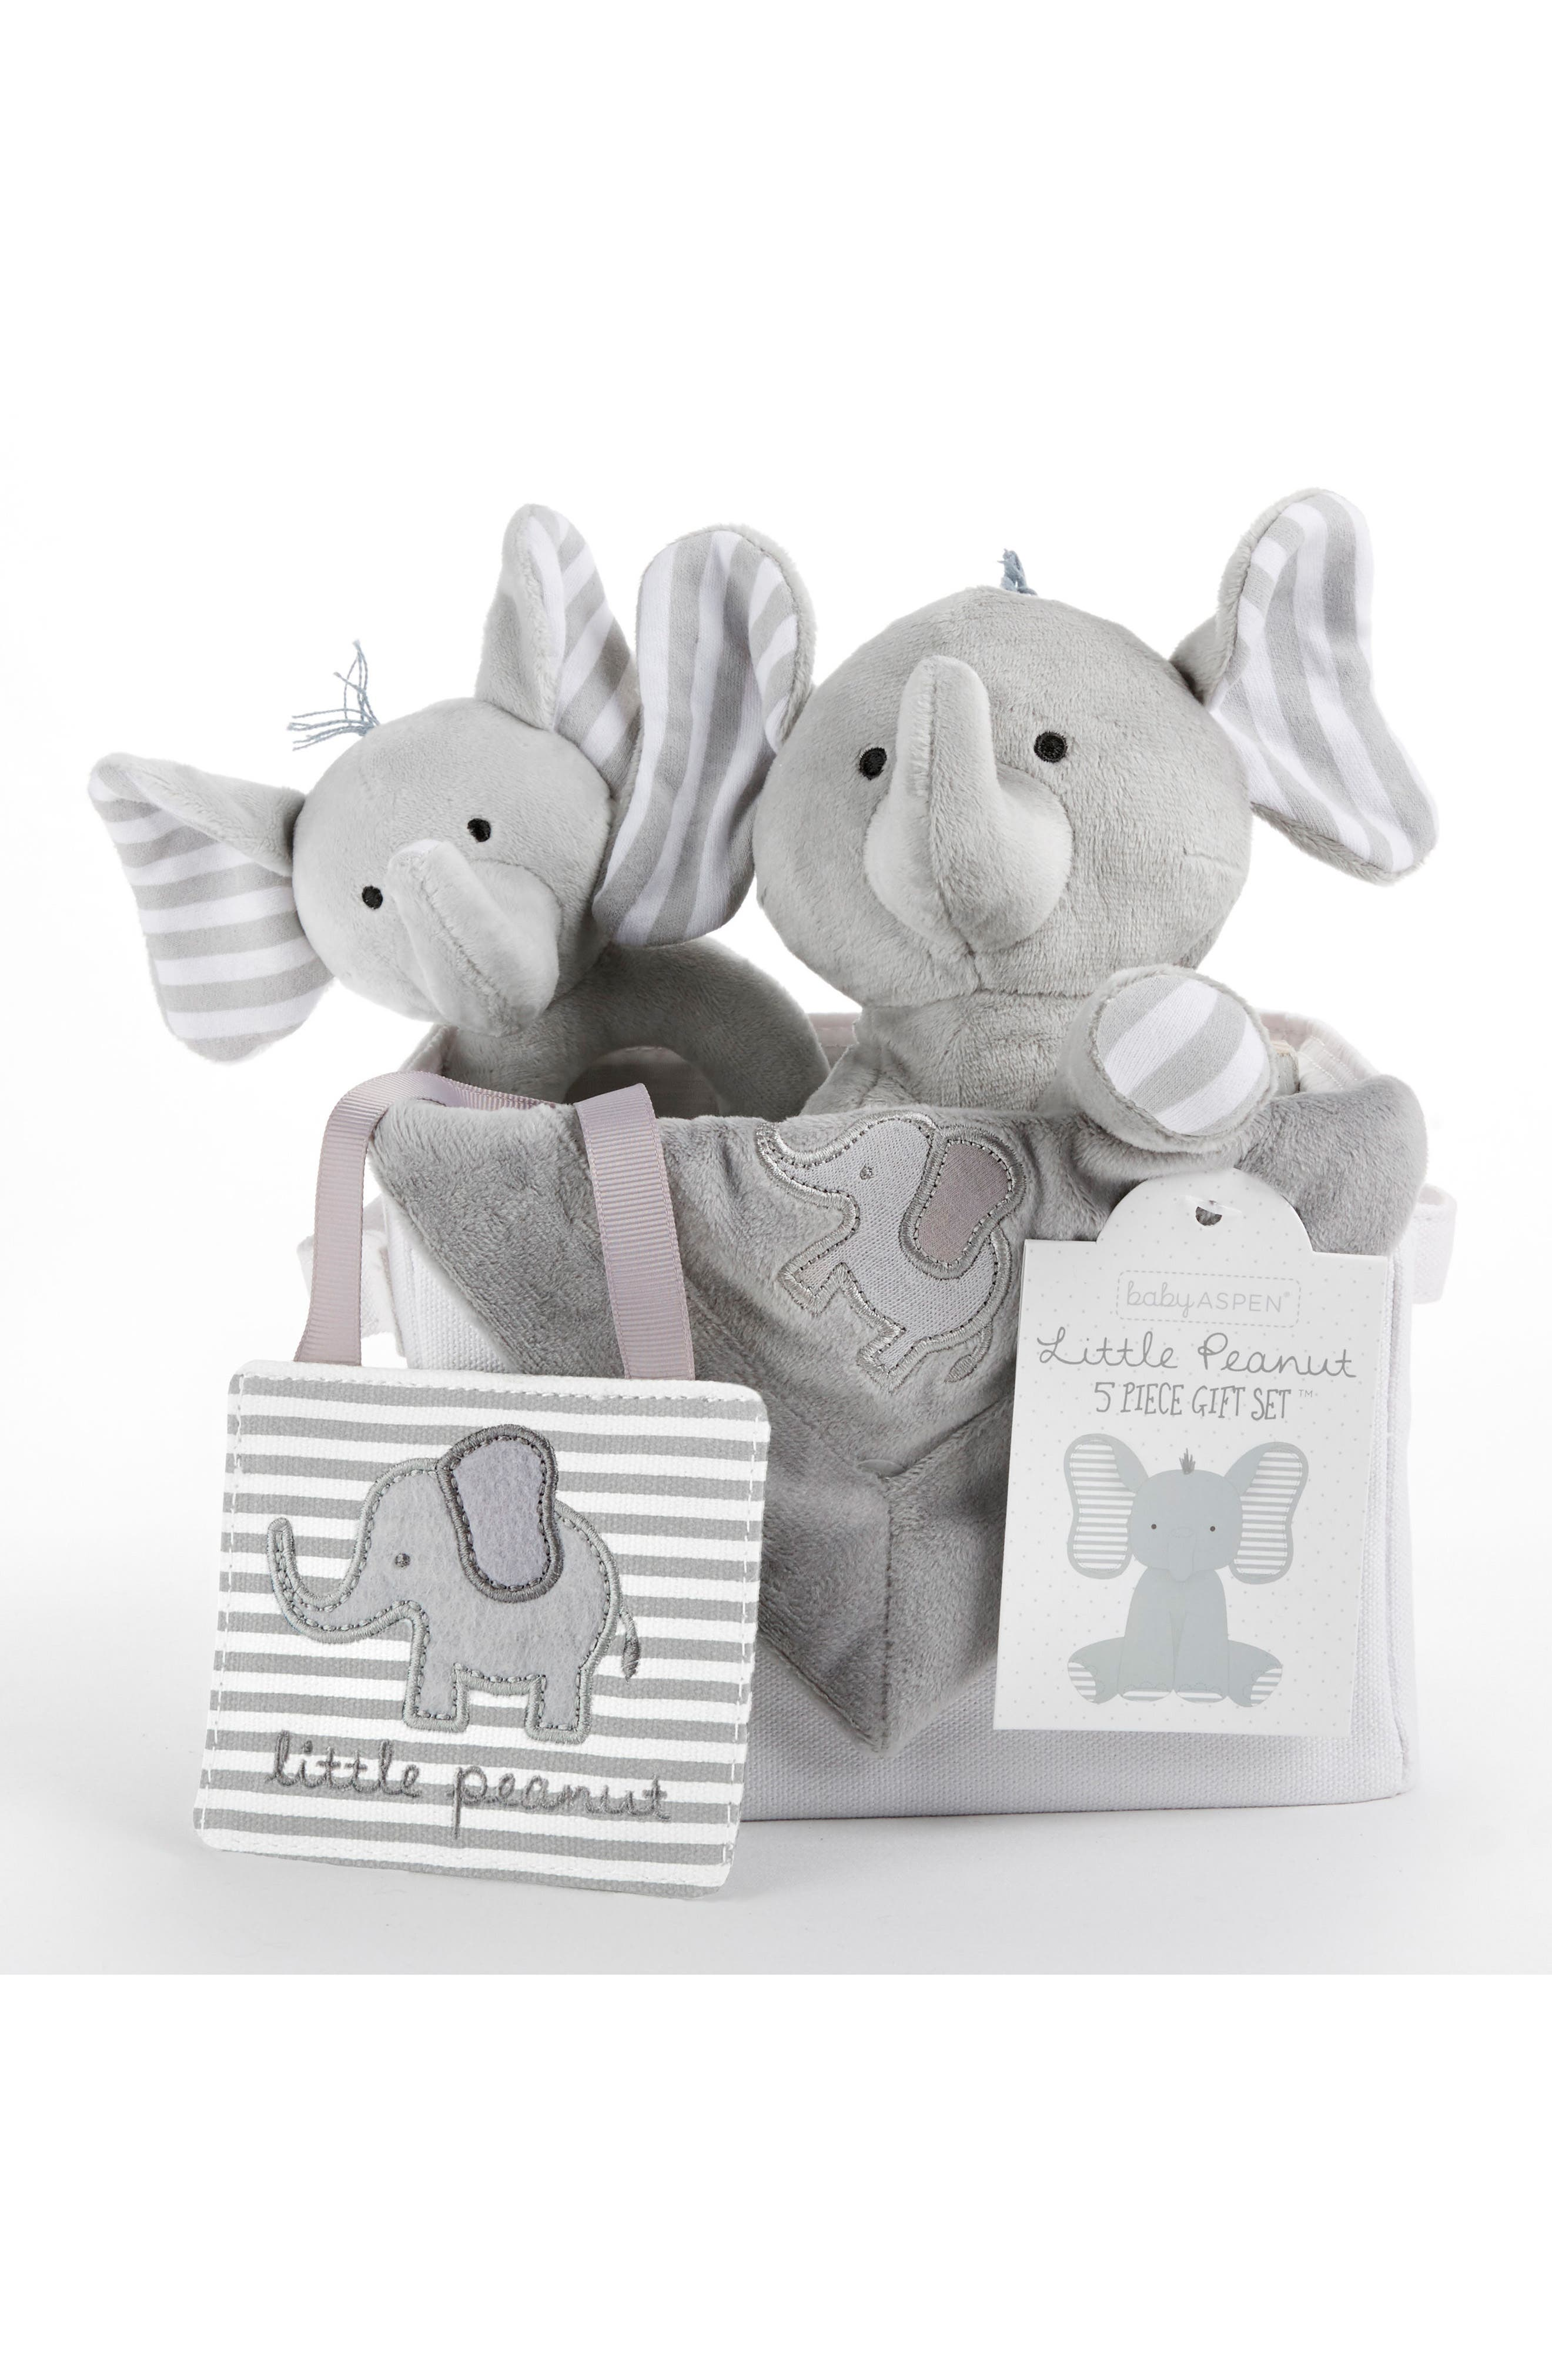 Alternate Image 1 Selected - Baby Aspen Little Peanut Elephant 5-Piece Gift Set